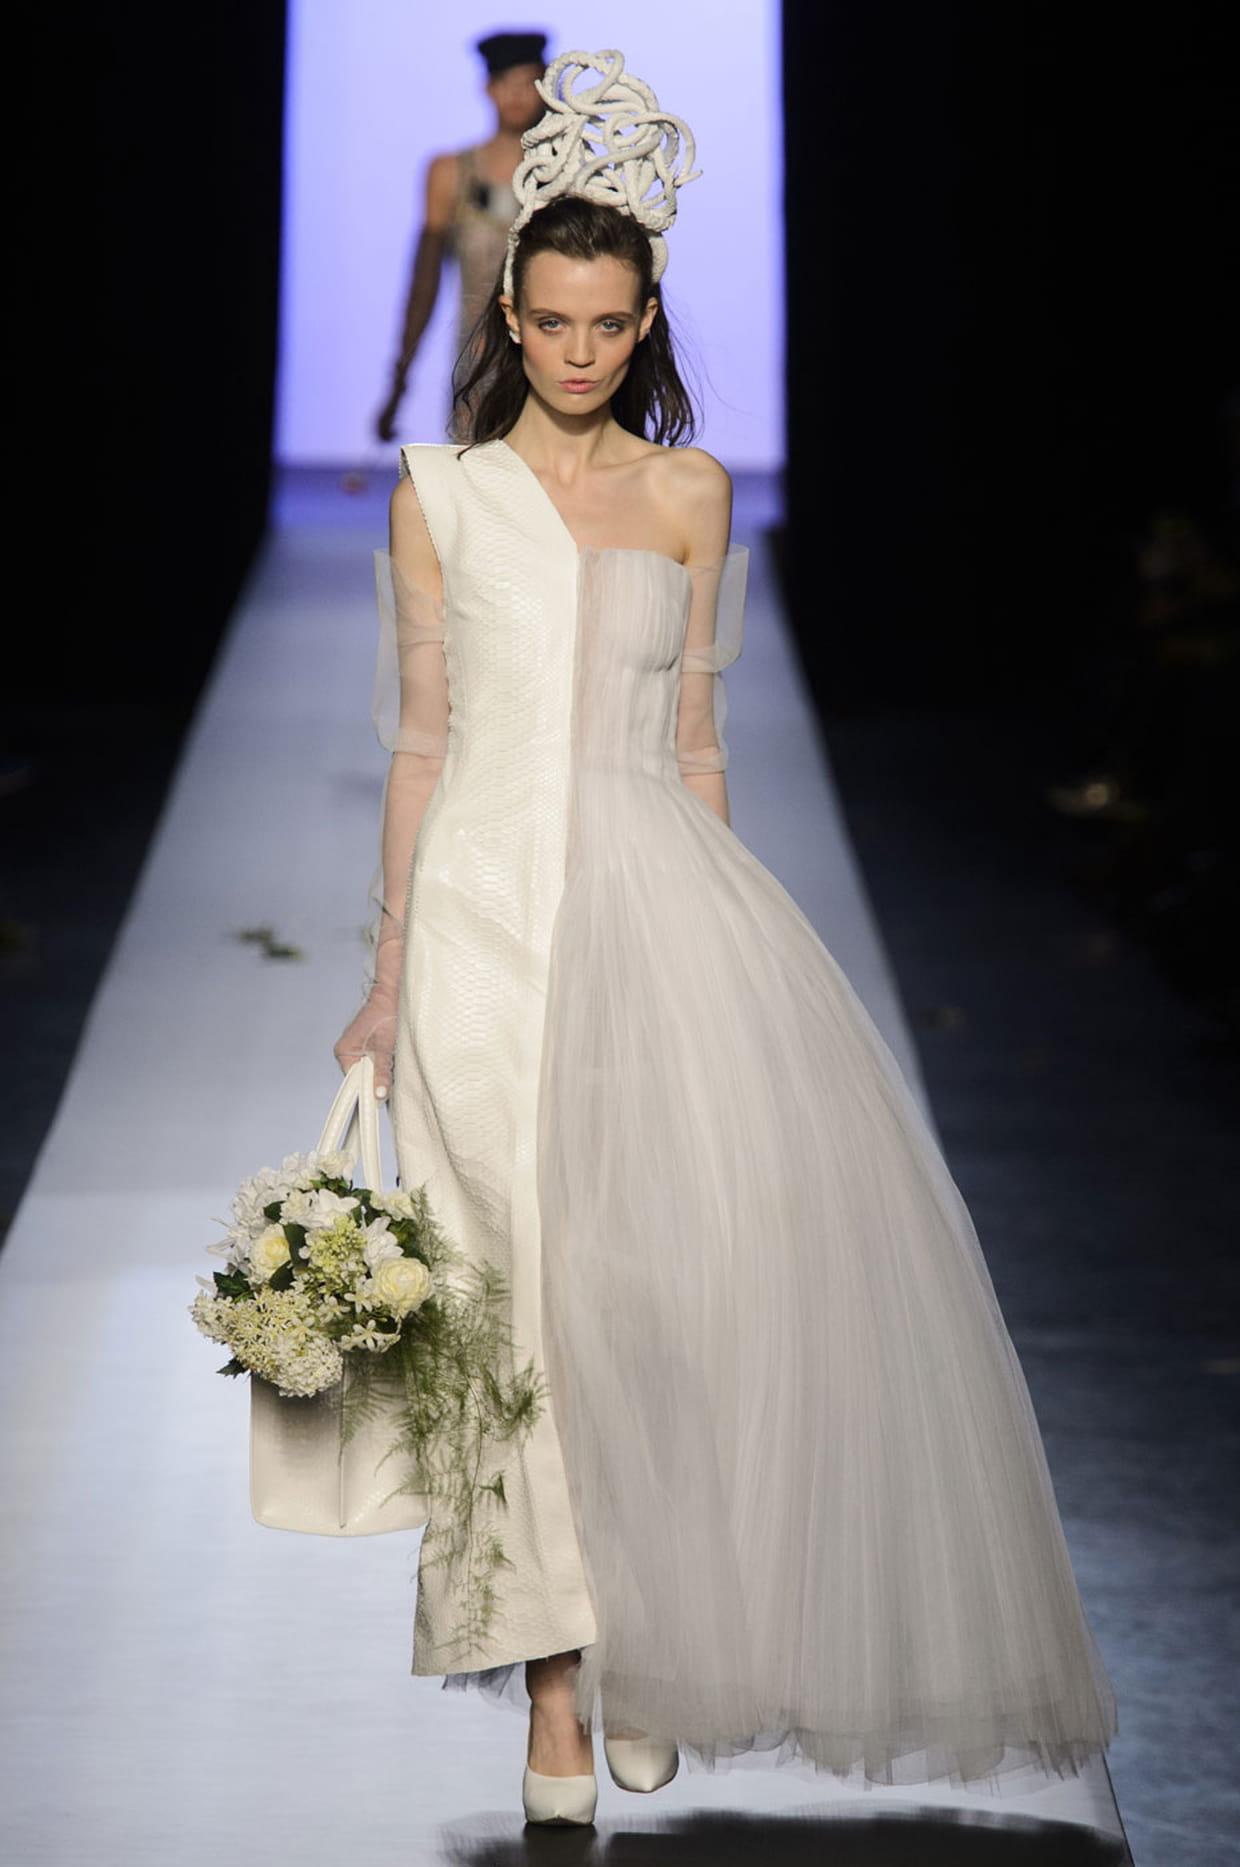 Robe de mari e jean paul gaultier asym trique for Prix de robe de mariage en or georges chakra